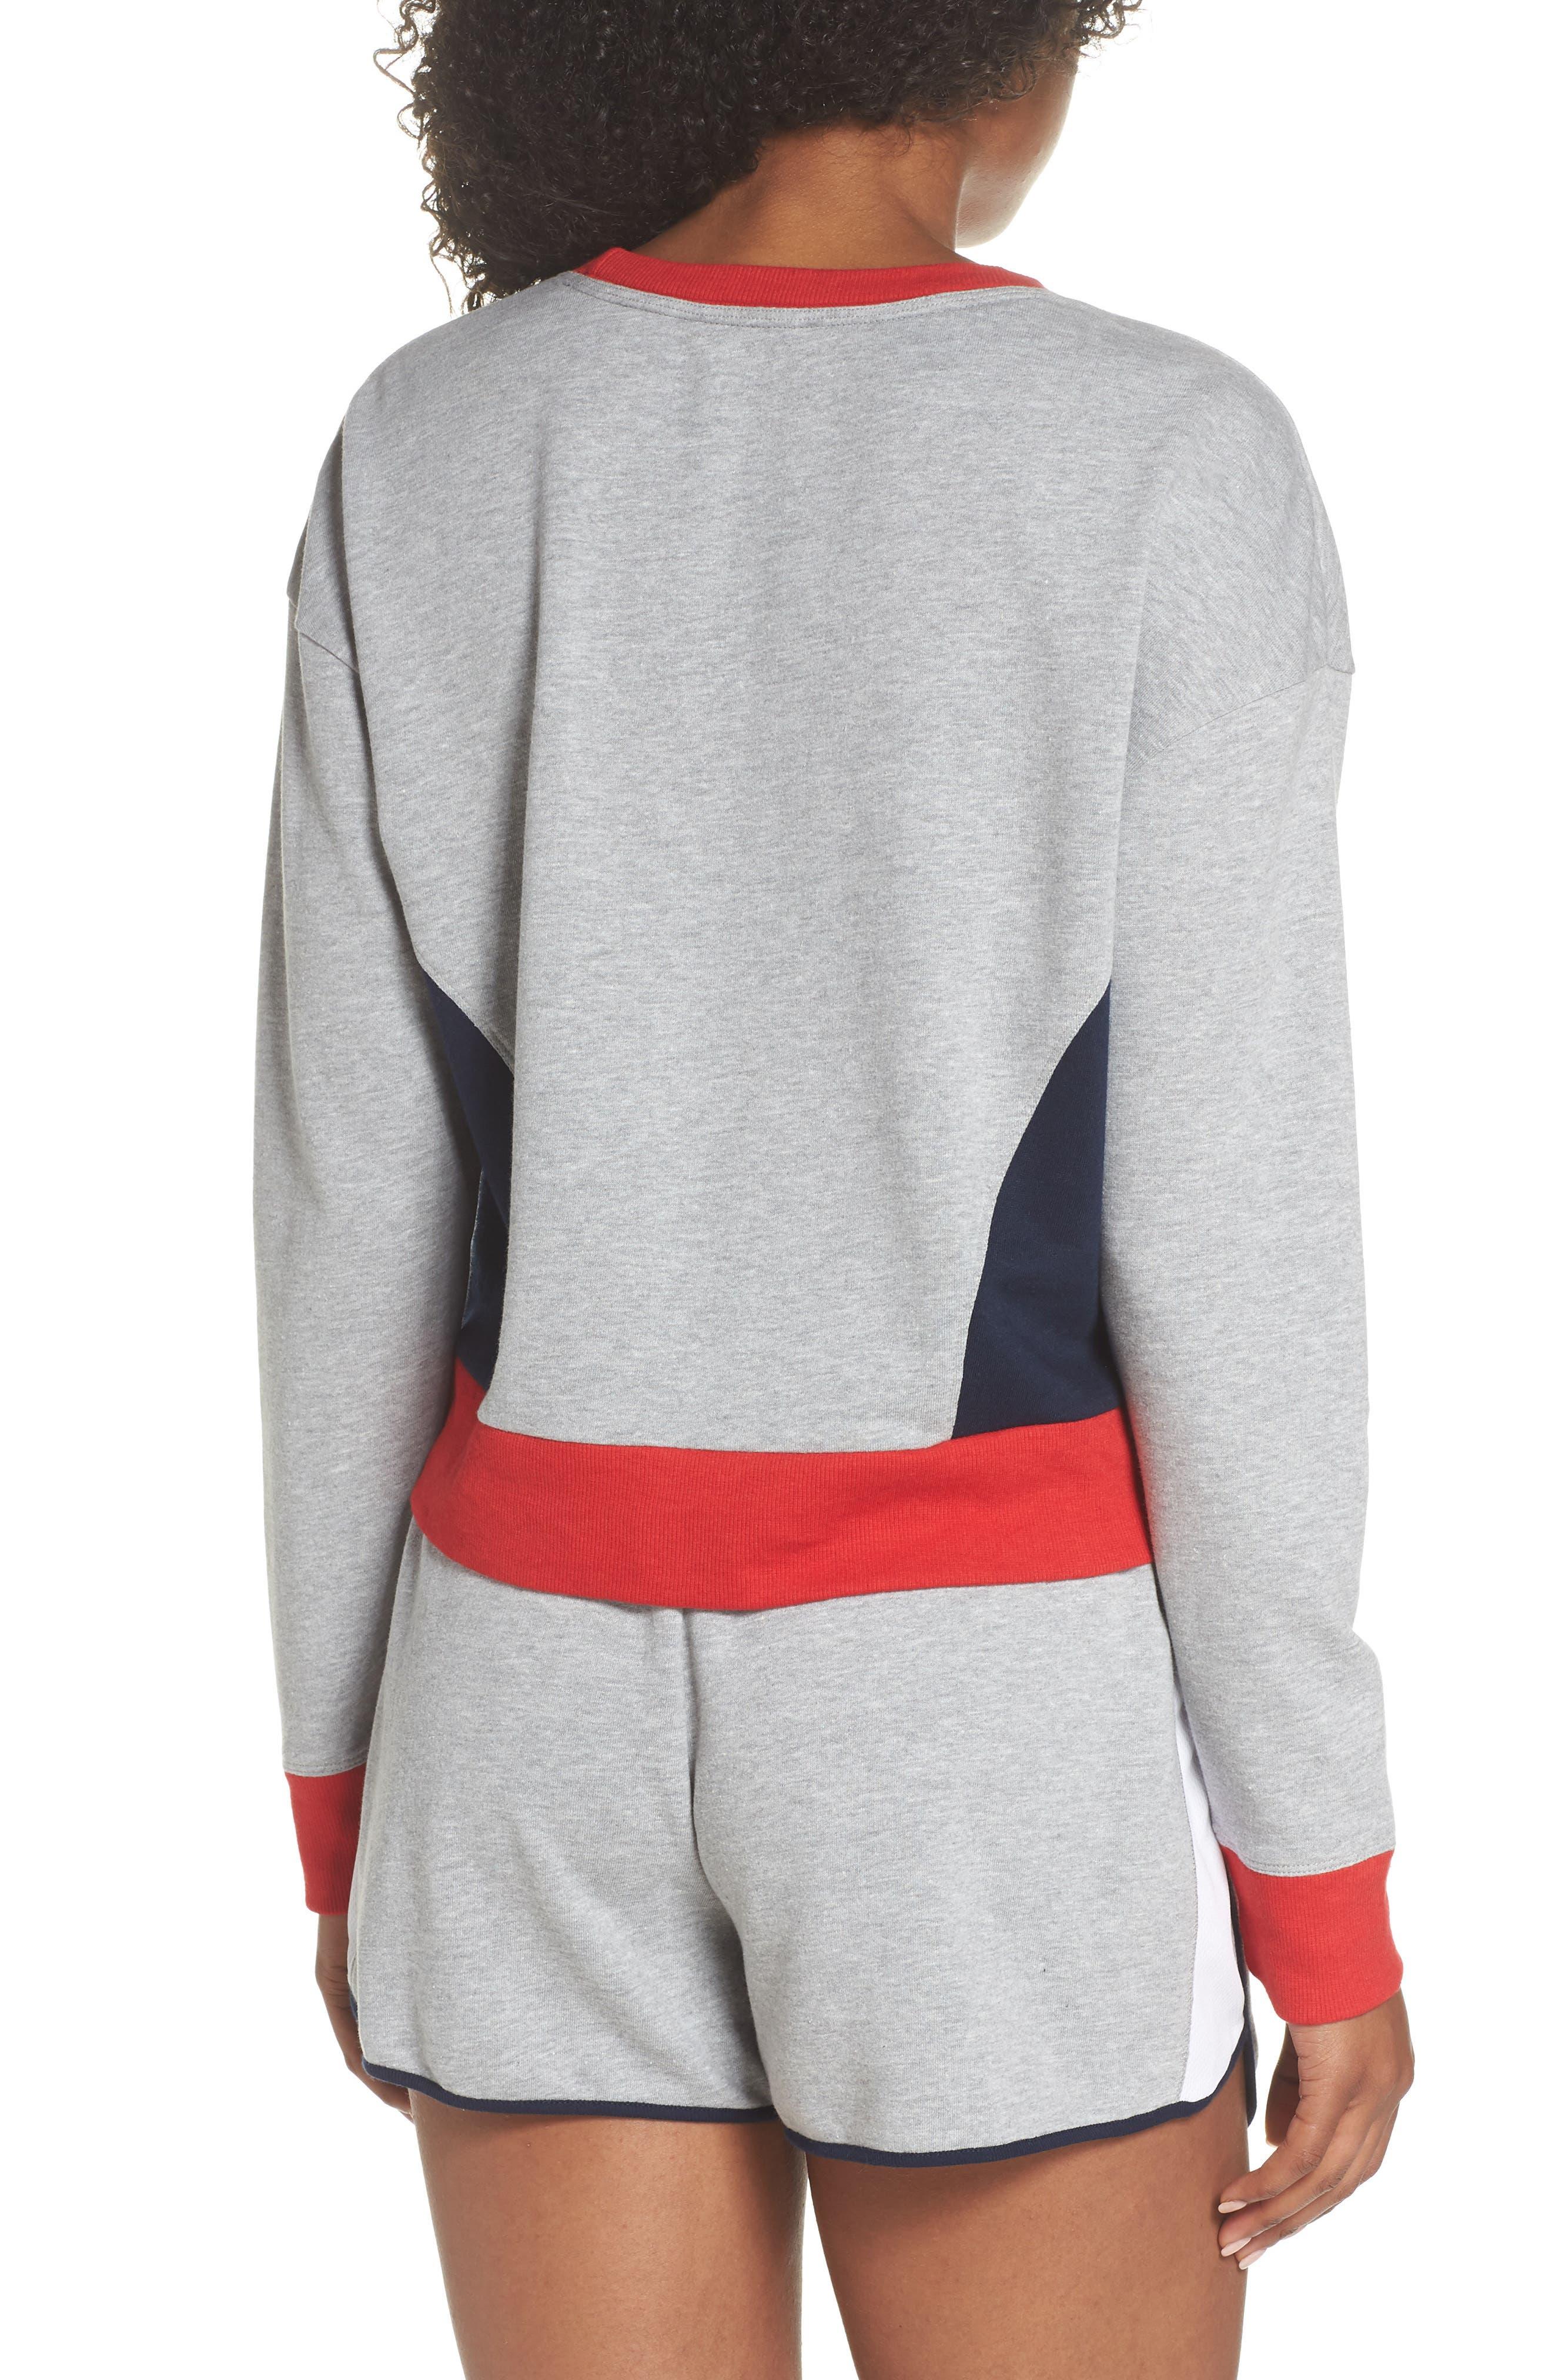 TOMMY HILFIGER,                             Crop Lounge Sweatshirt,                             Alternate thumbnail 2, color,                             025